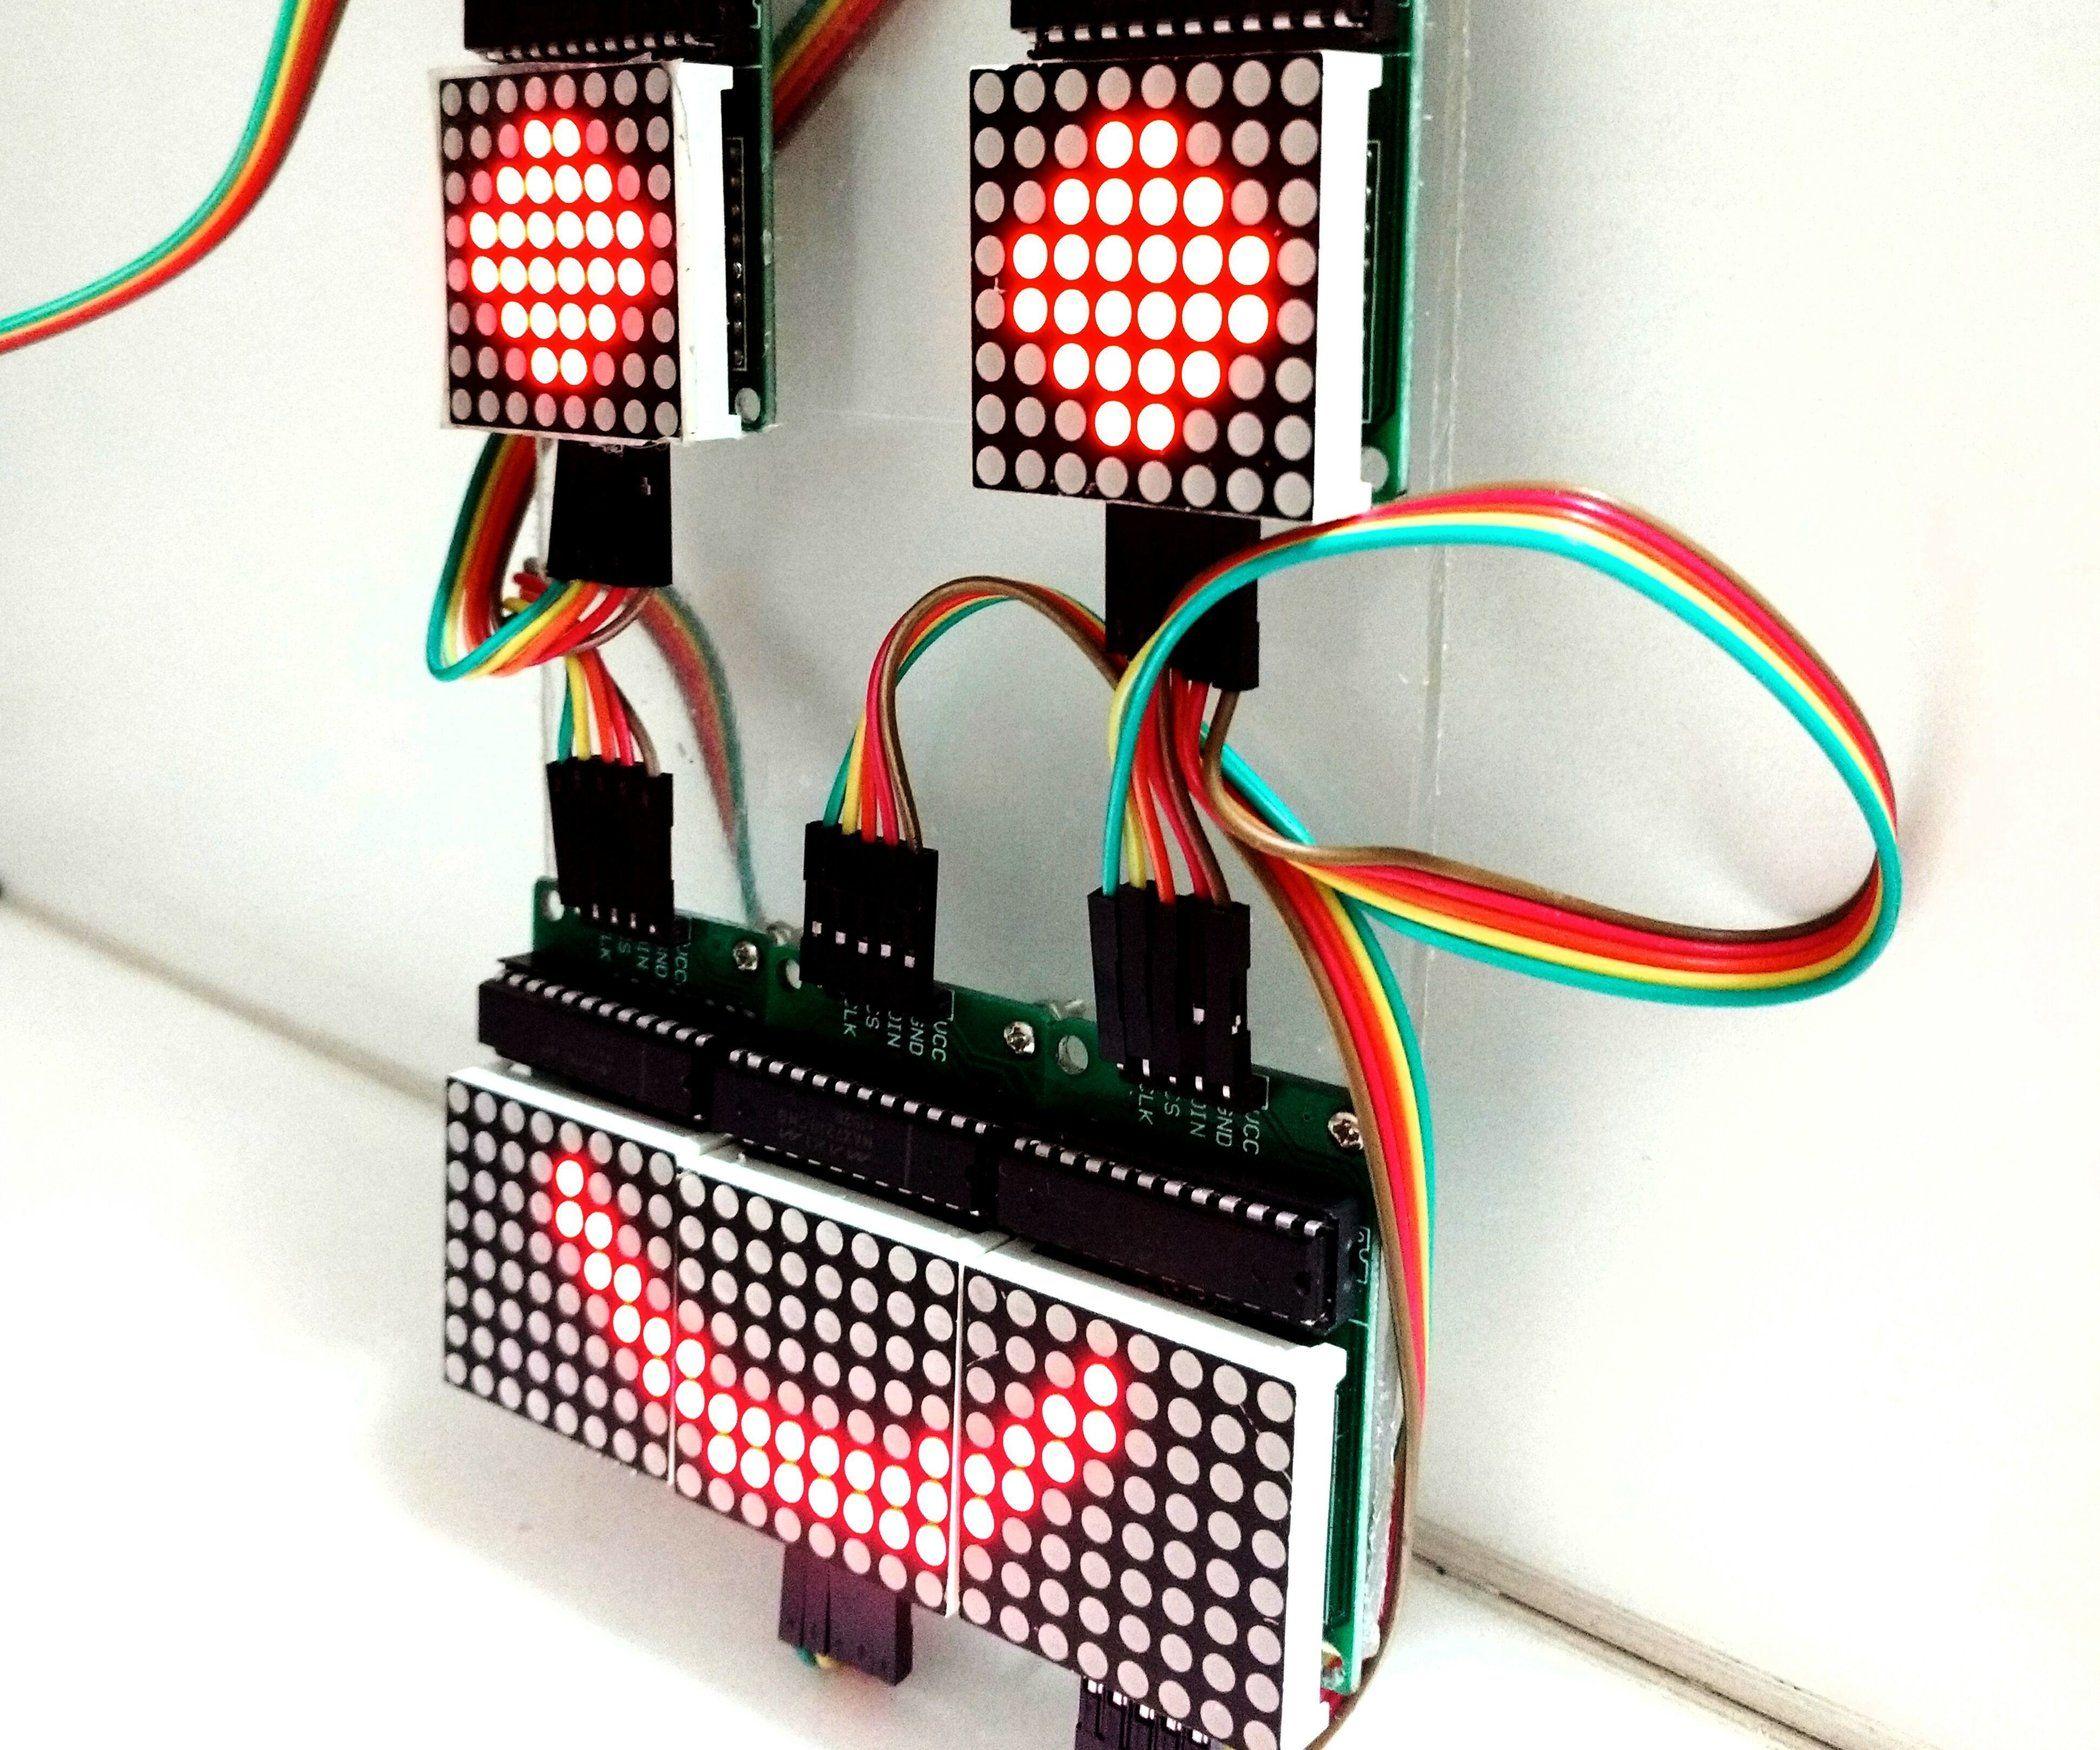 Controlling LED Matrix Array With Arduino Uno (Arduino